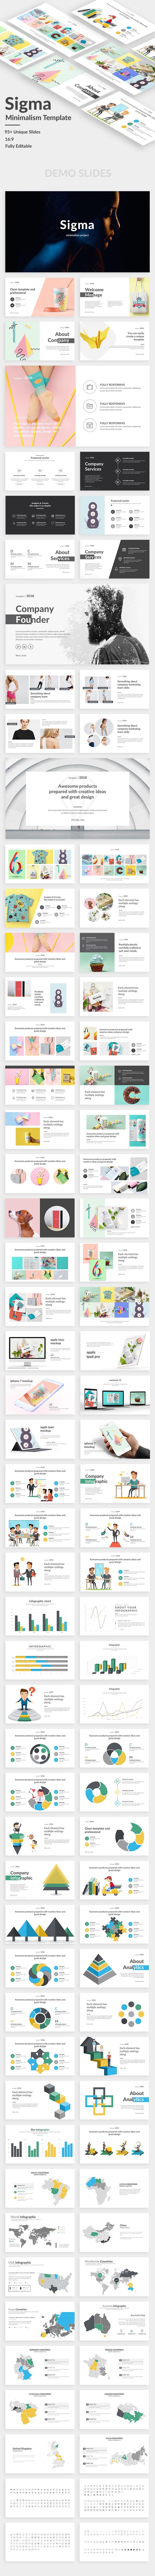 Sigma Minimalism Project Google Slide Template - Google Slides Presentation Templates